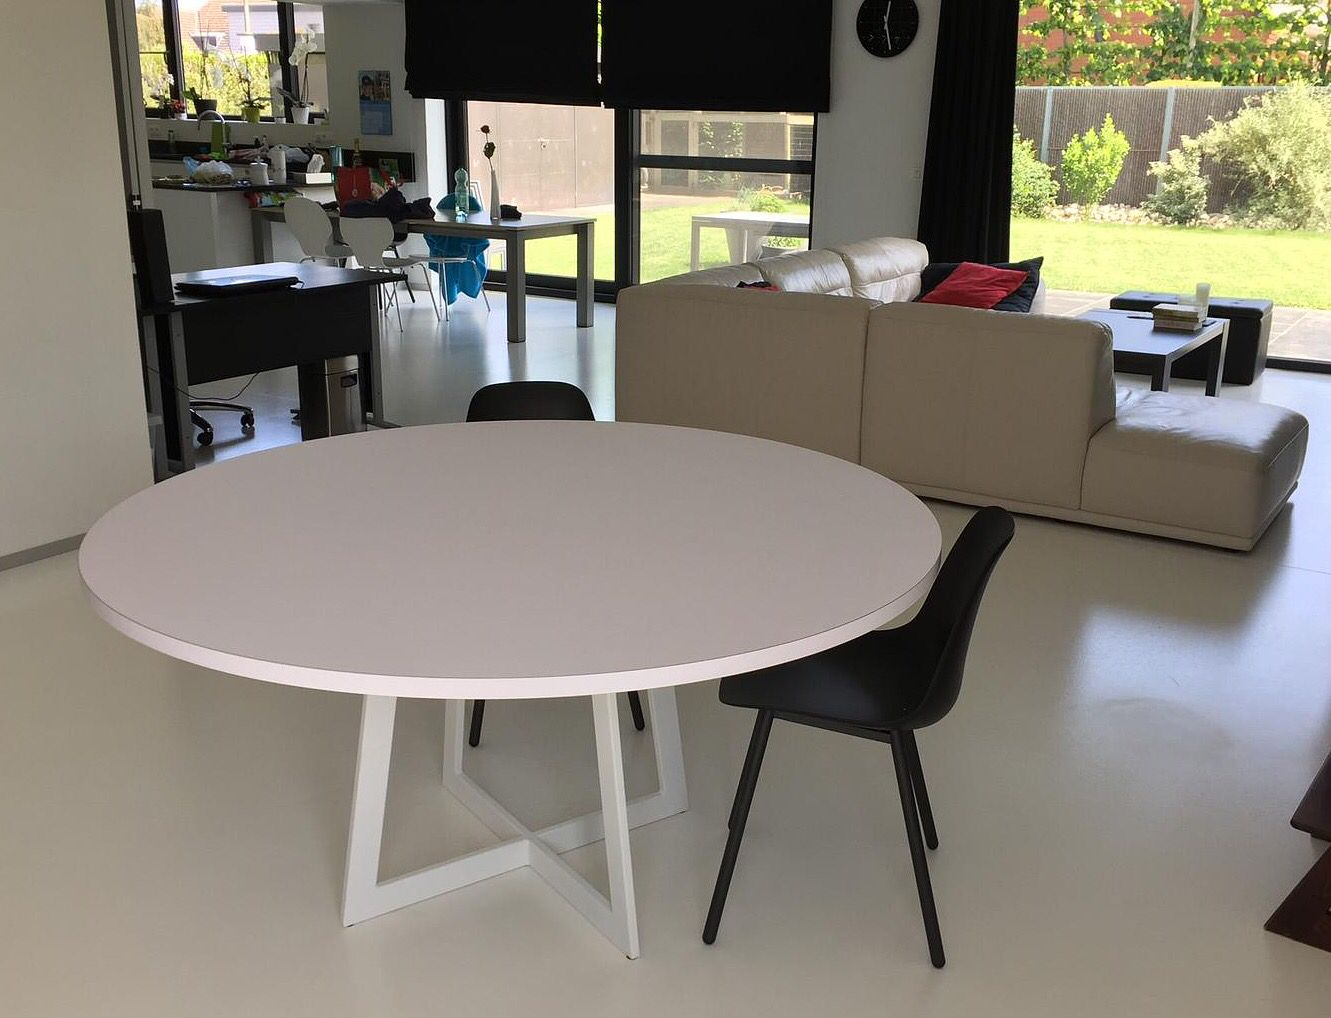 Eettafels Rond Modern.Carzello Moderne Ronde Tafel In 2019 Eettafel Witte